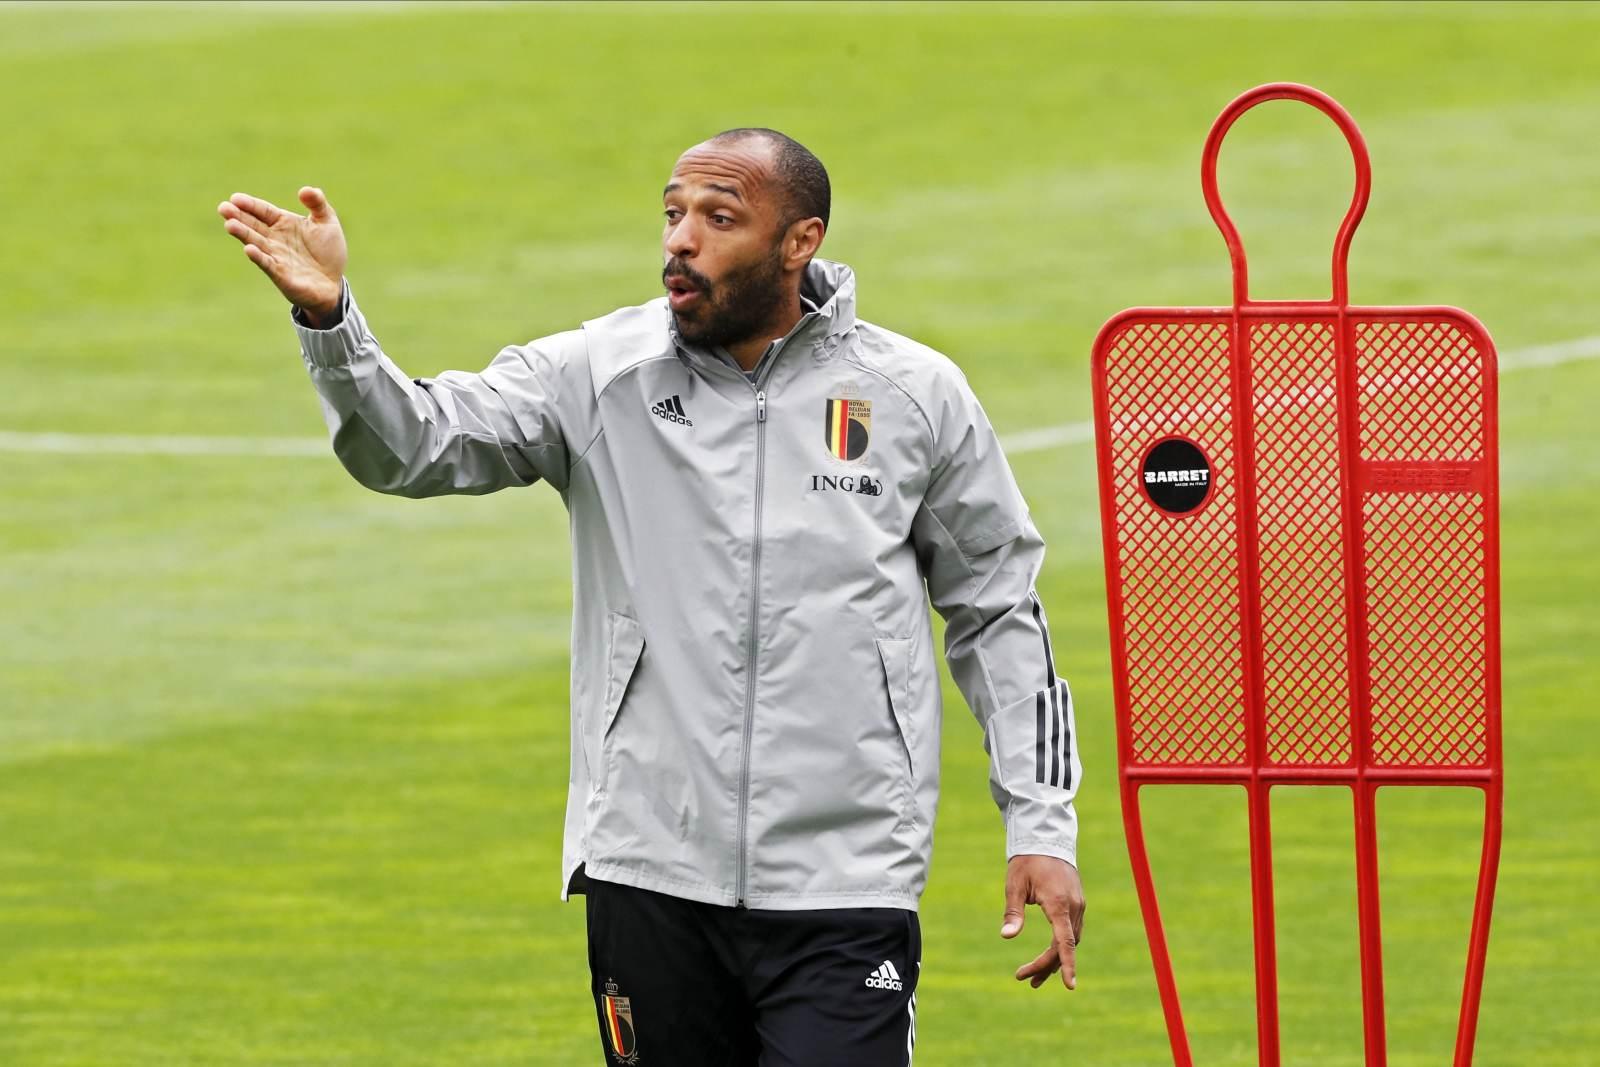 Анри ушёл из сборной Бельгии